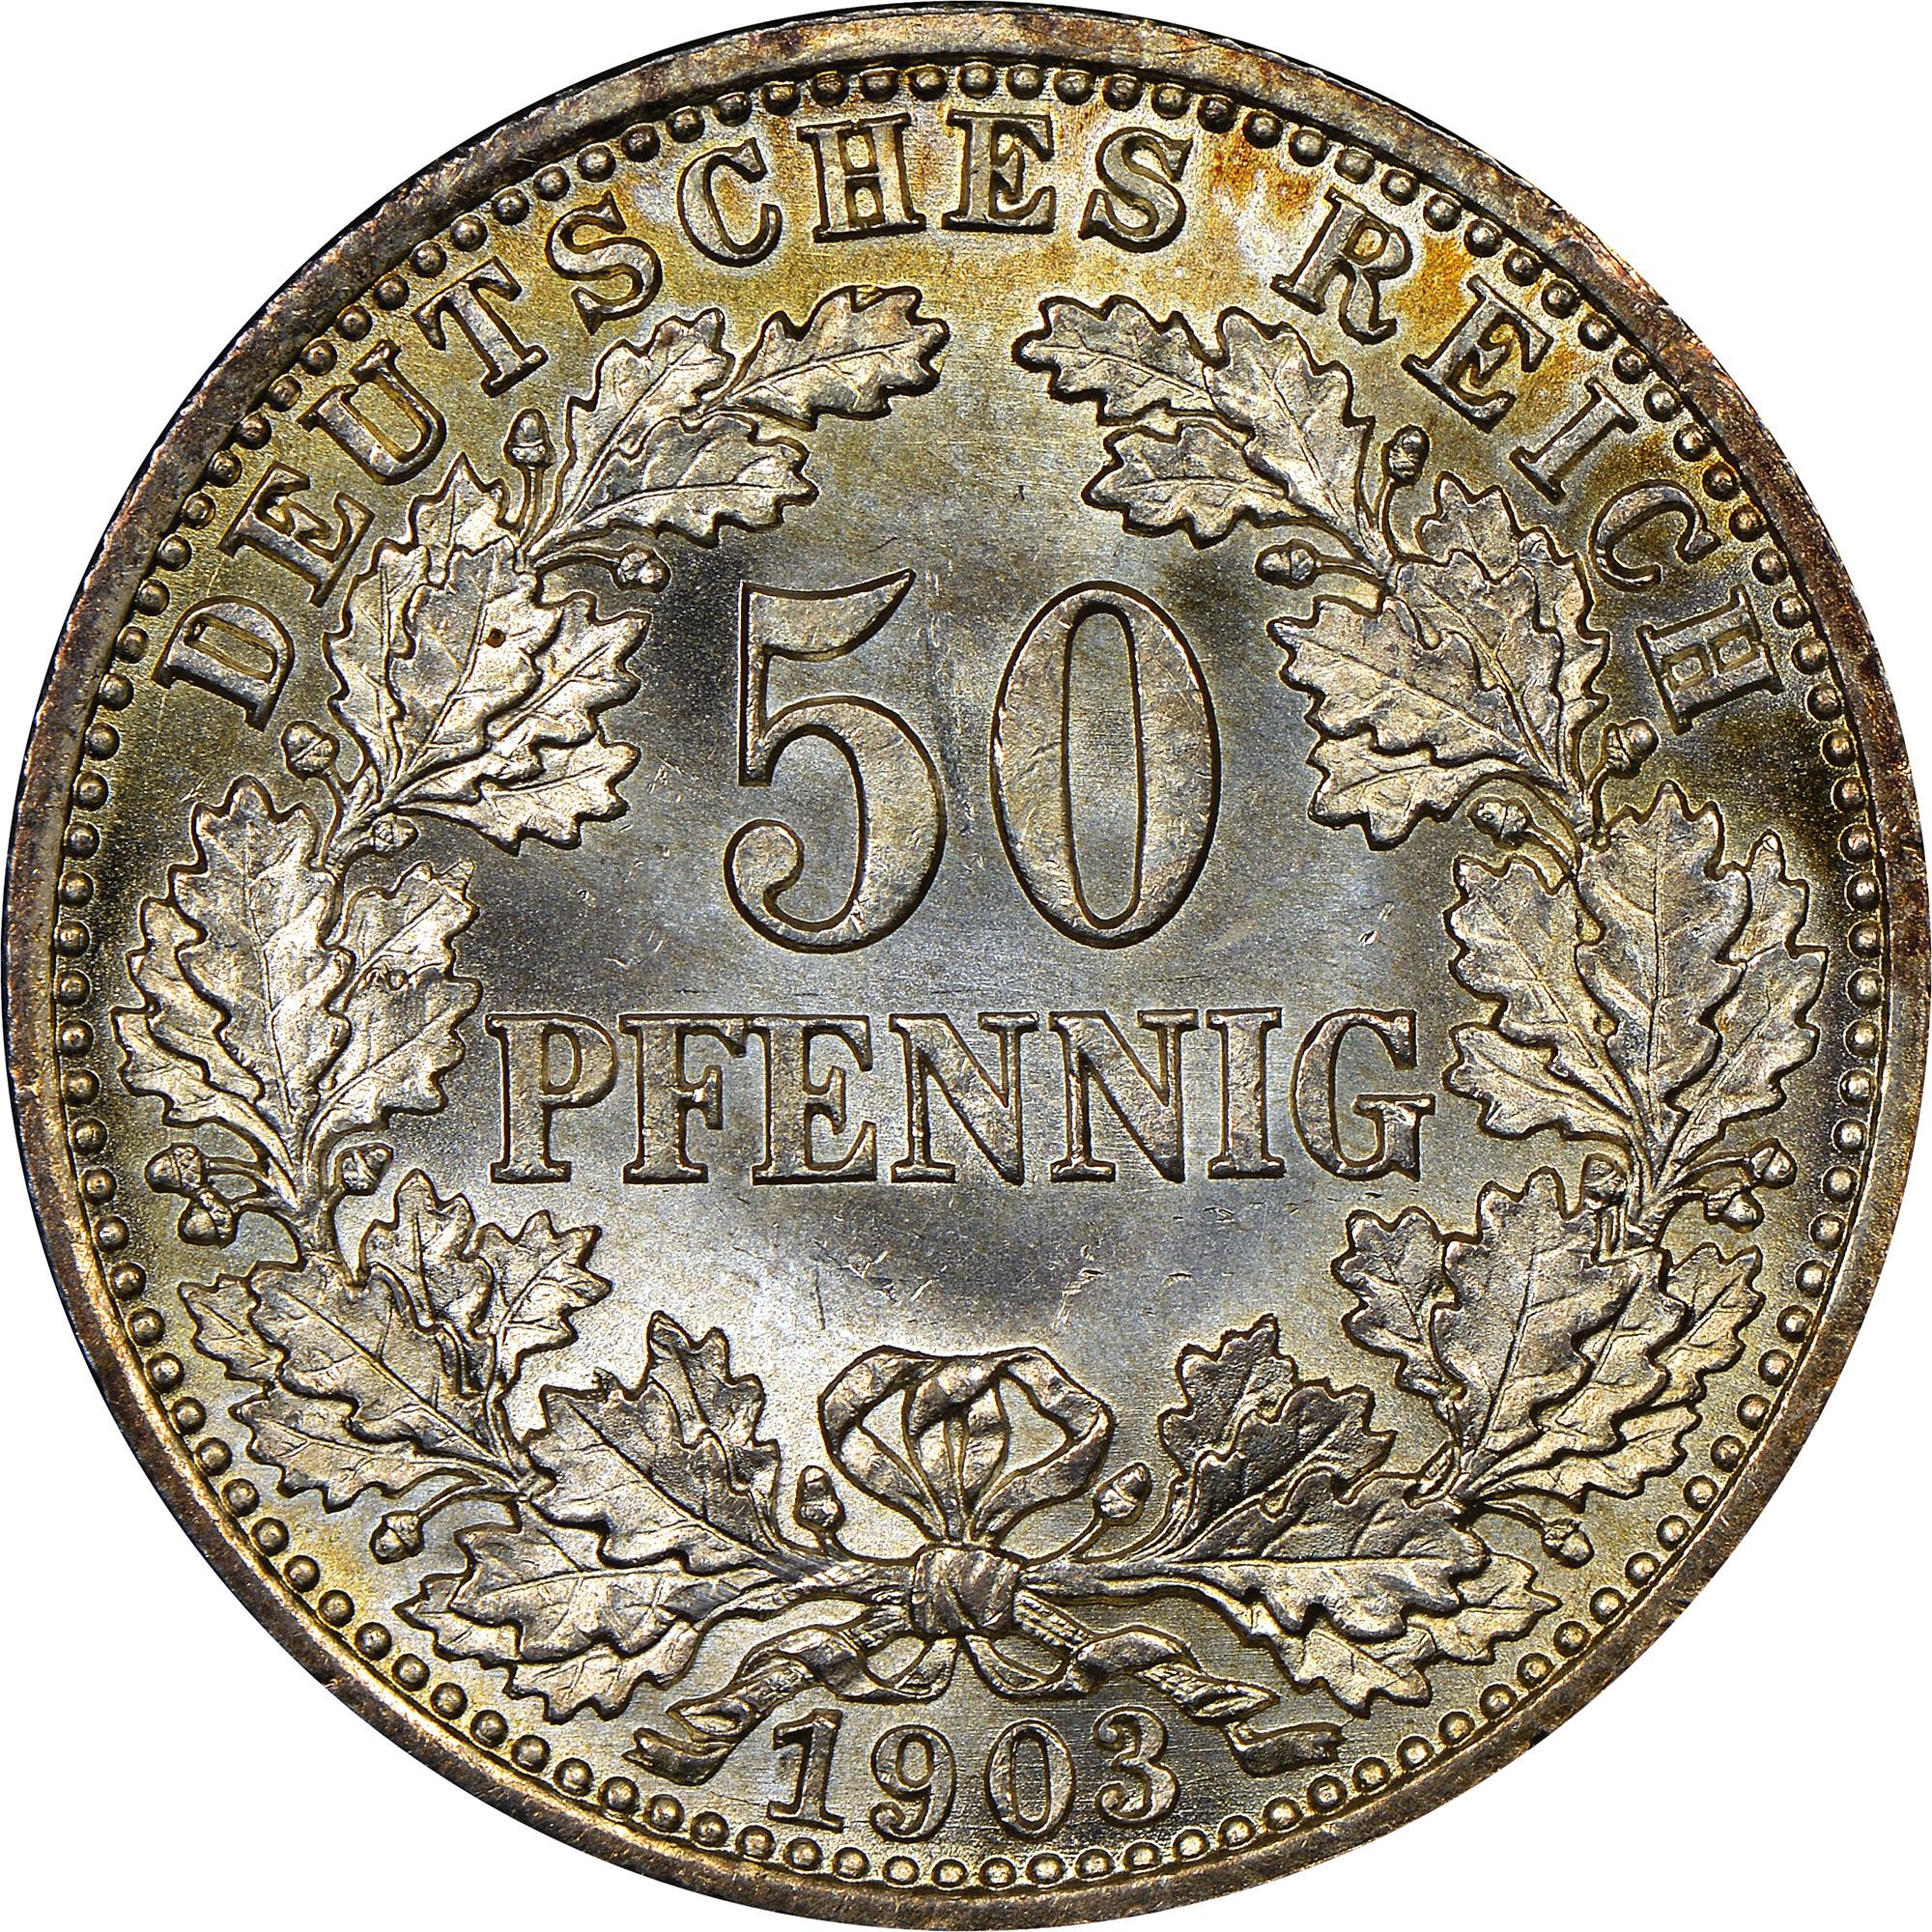 Germany - Empire 50 Pfennig obverse